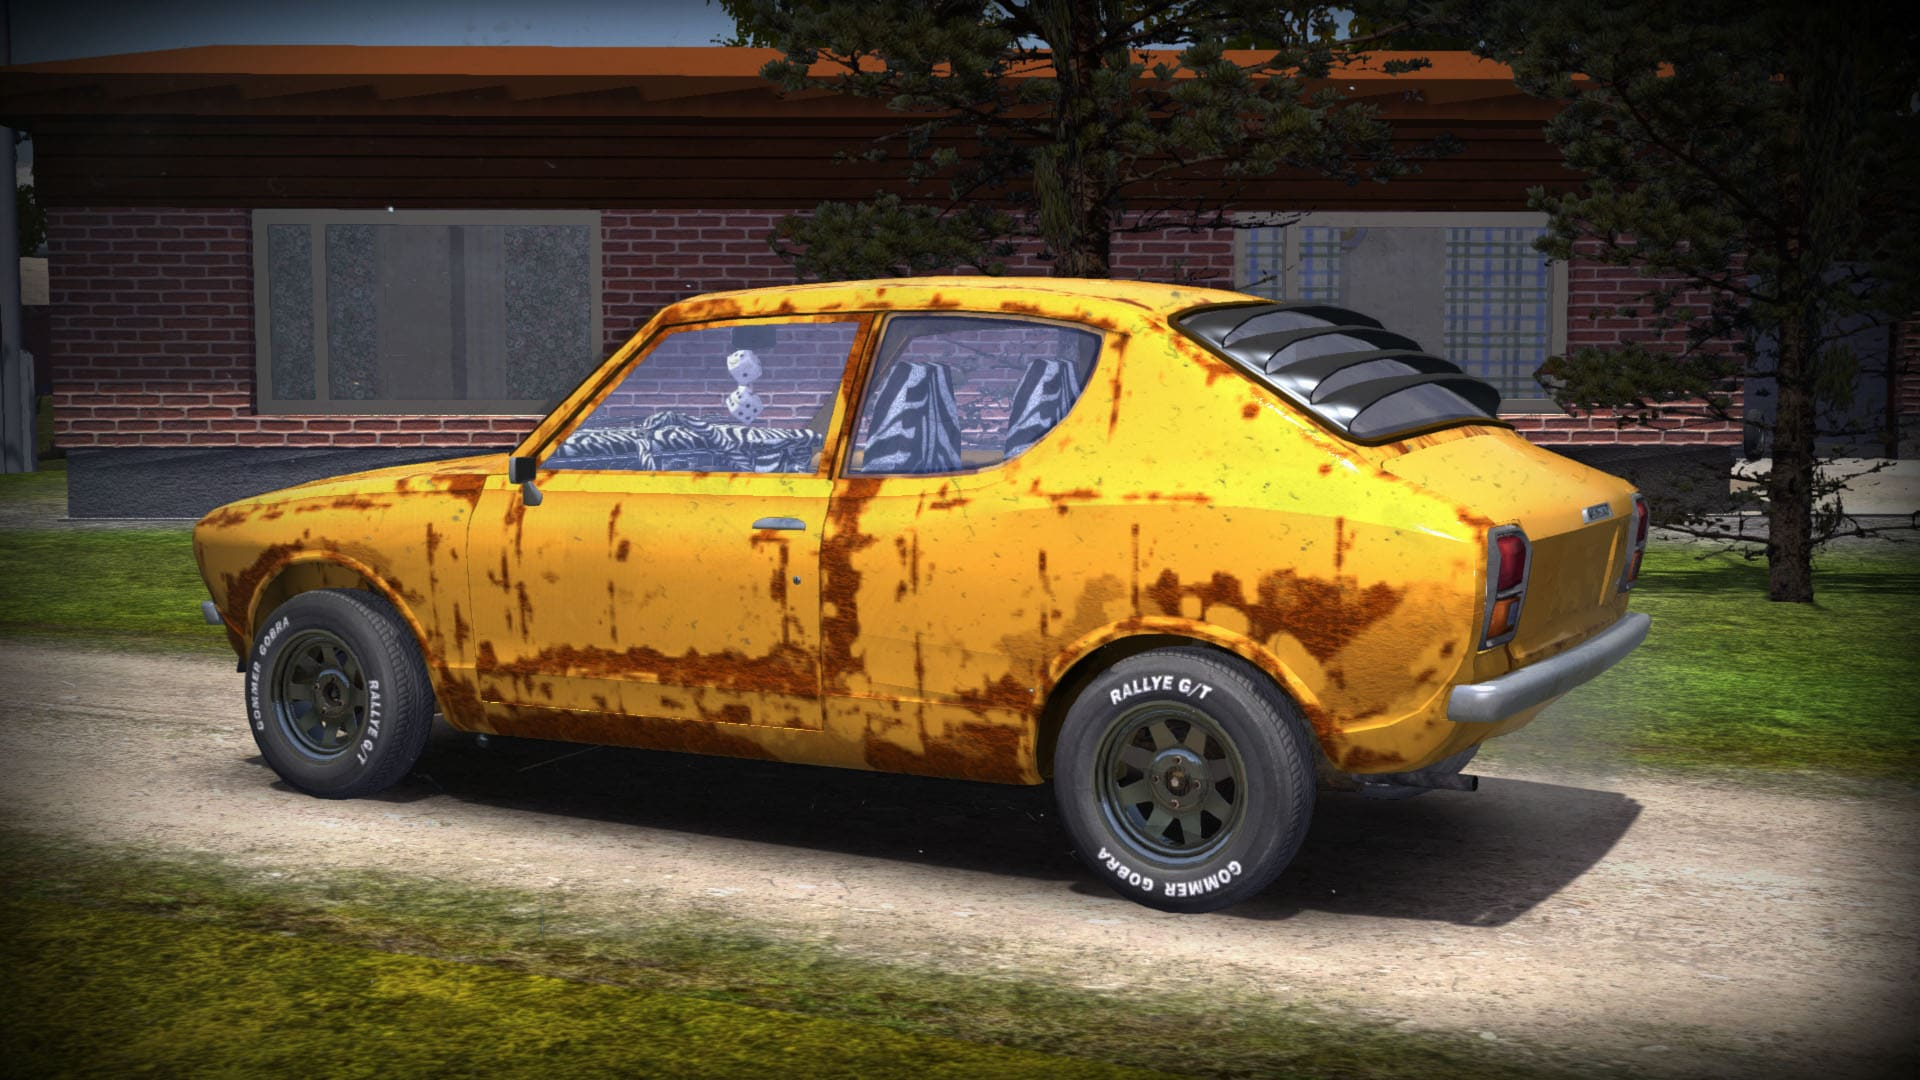 Junk Cars Ball Ground